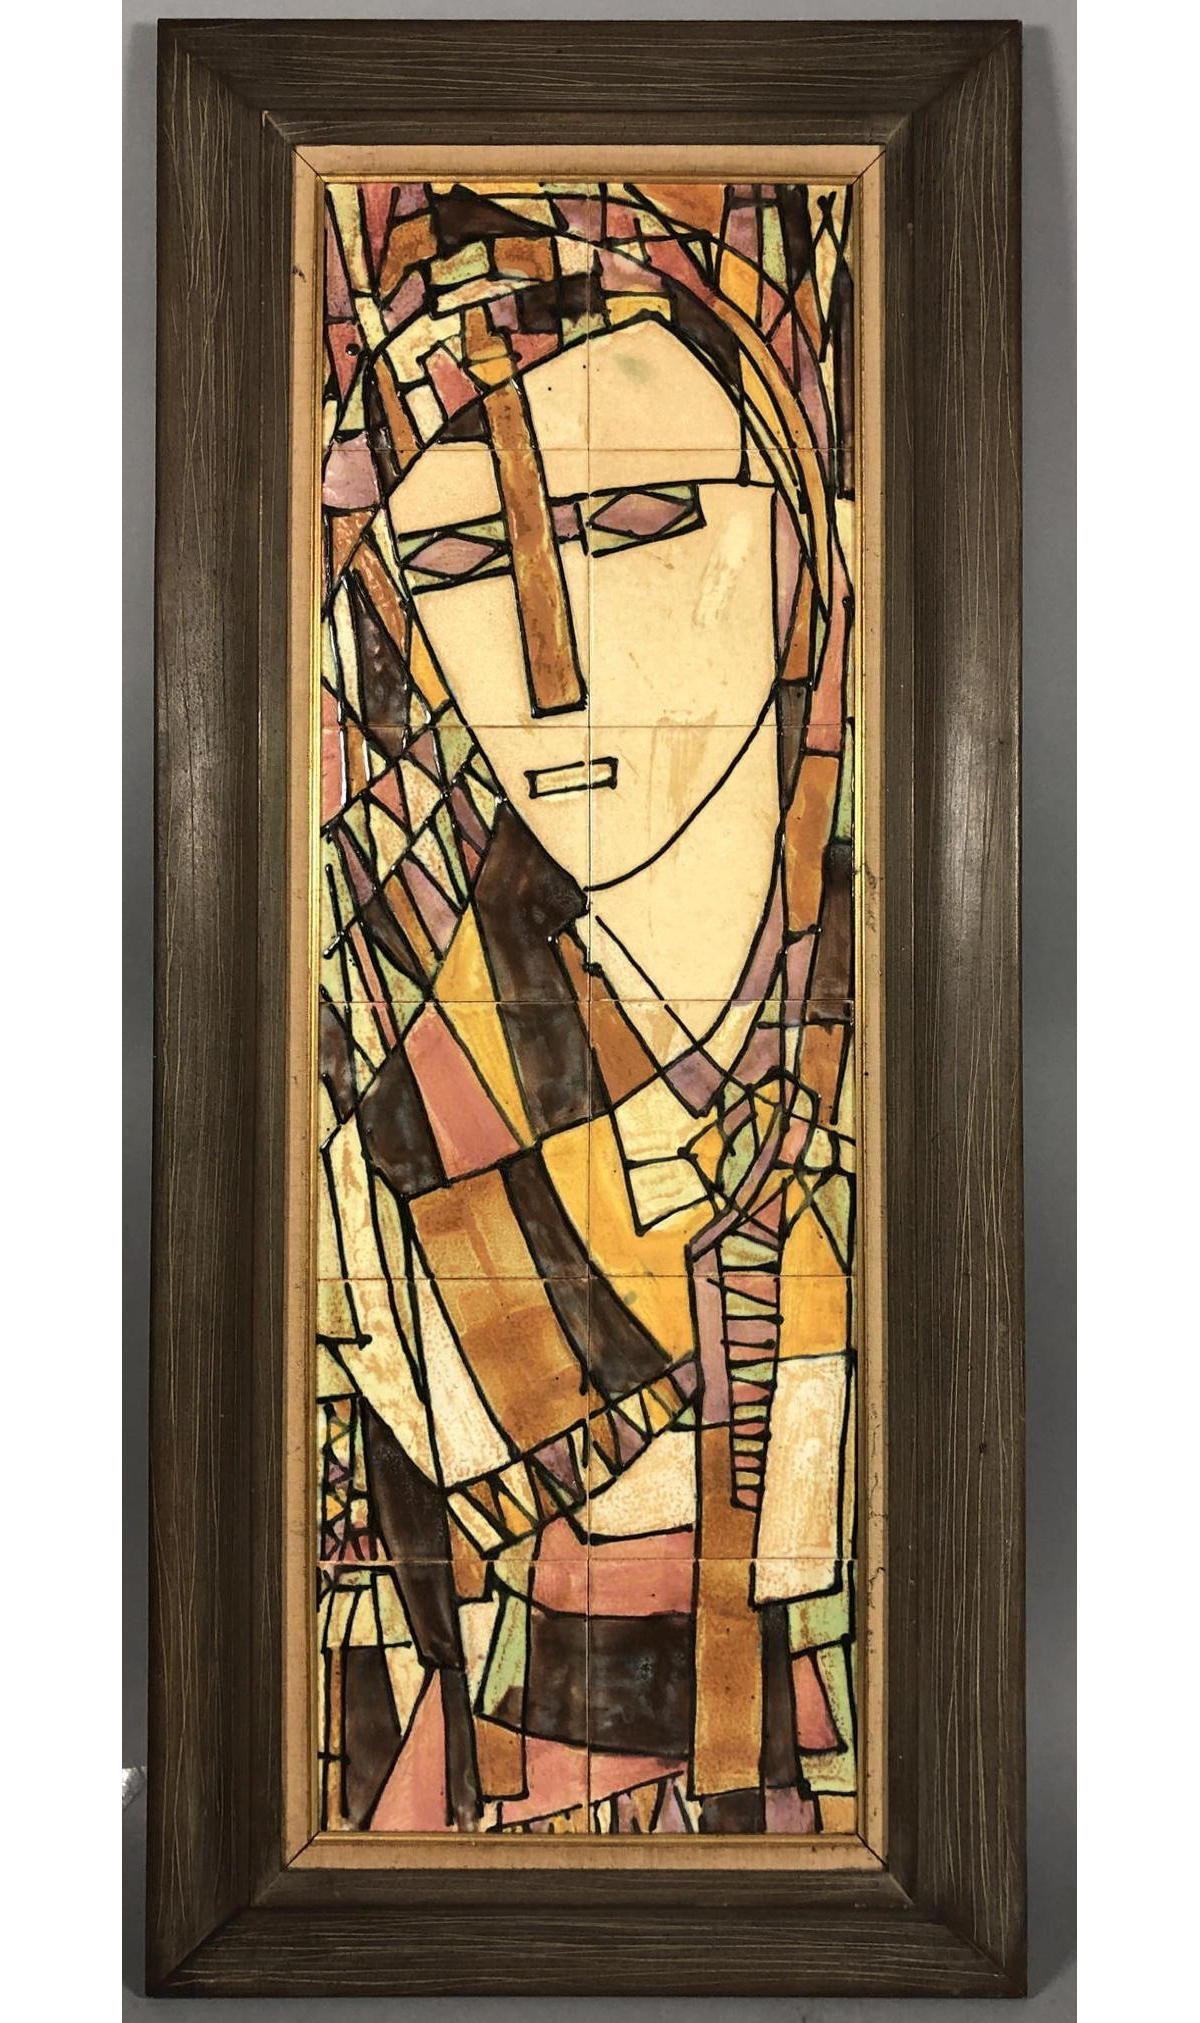 Harris G Strong Hand Painted Ceramic Tile. Modern